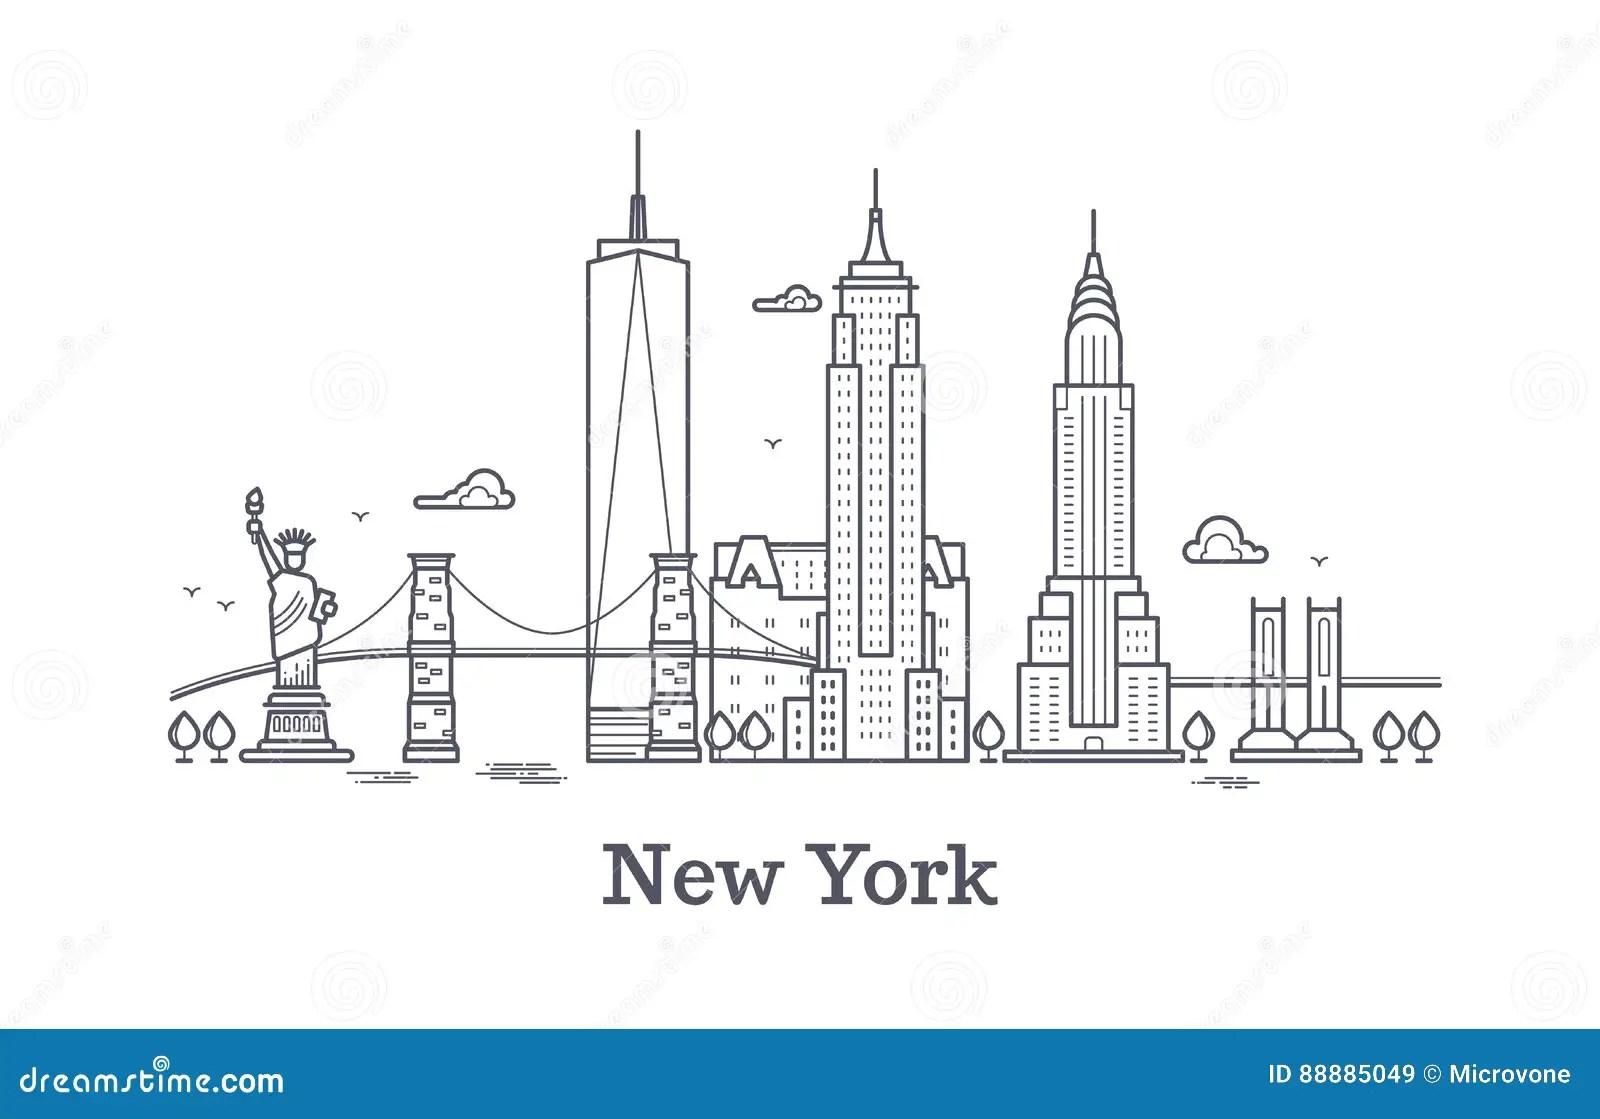 New York City Background Concept Stock Photo